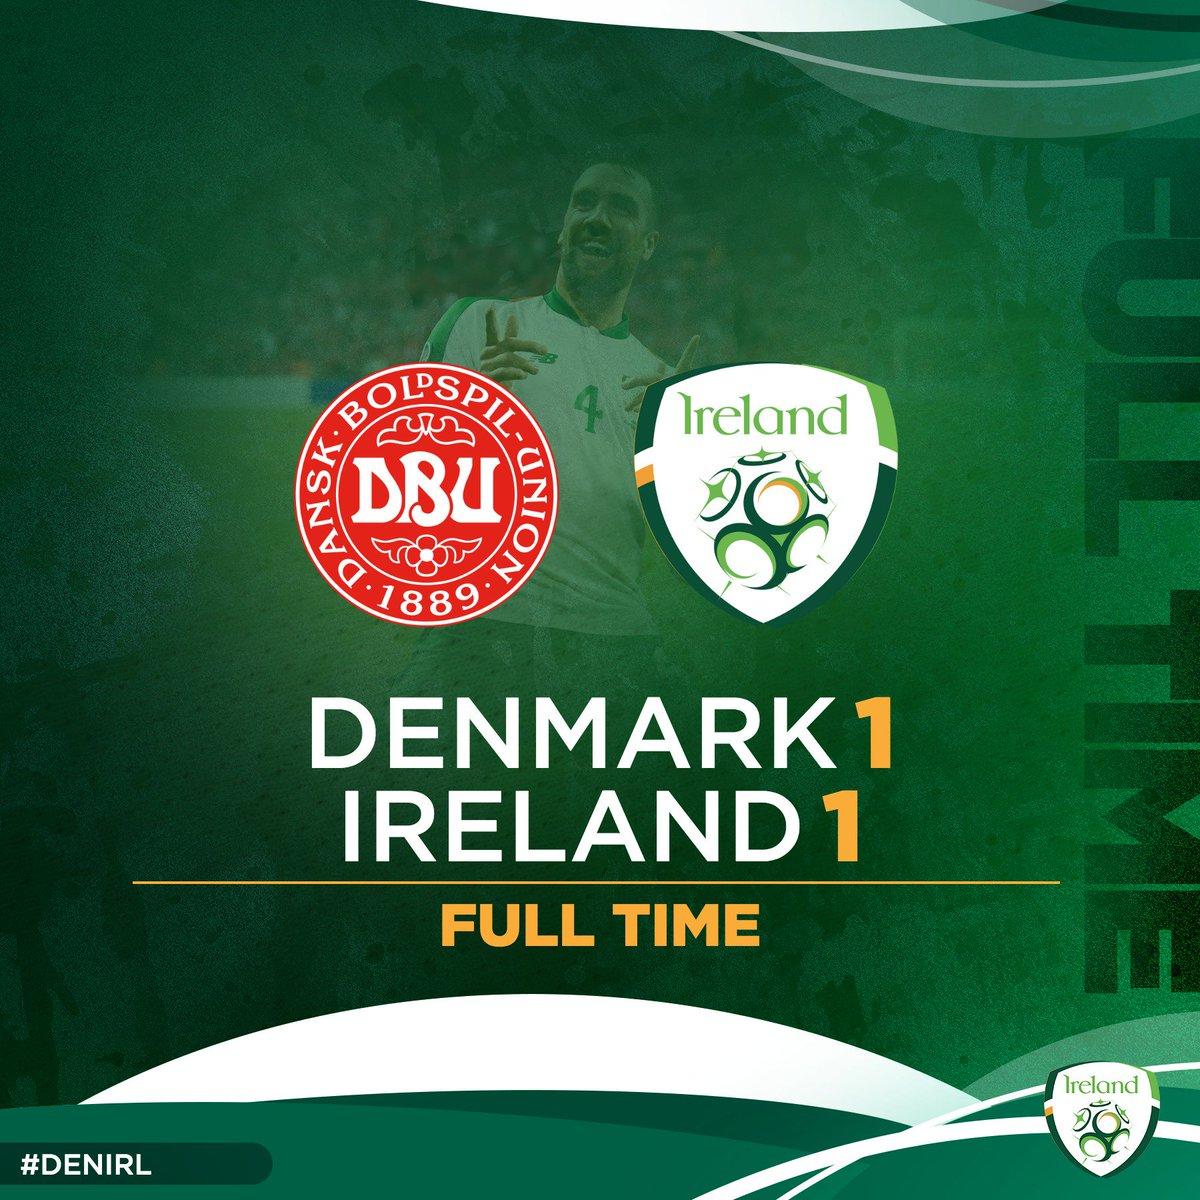 Thomas Delaney's 'most annoying opponent' earn a hard fought draw in Copenhagen 💪🇮🇪👏 #DENIRL #COYBIG https://t.co/iSyF2AgzEn